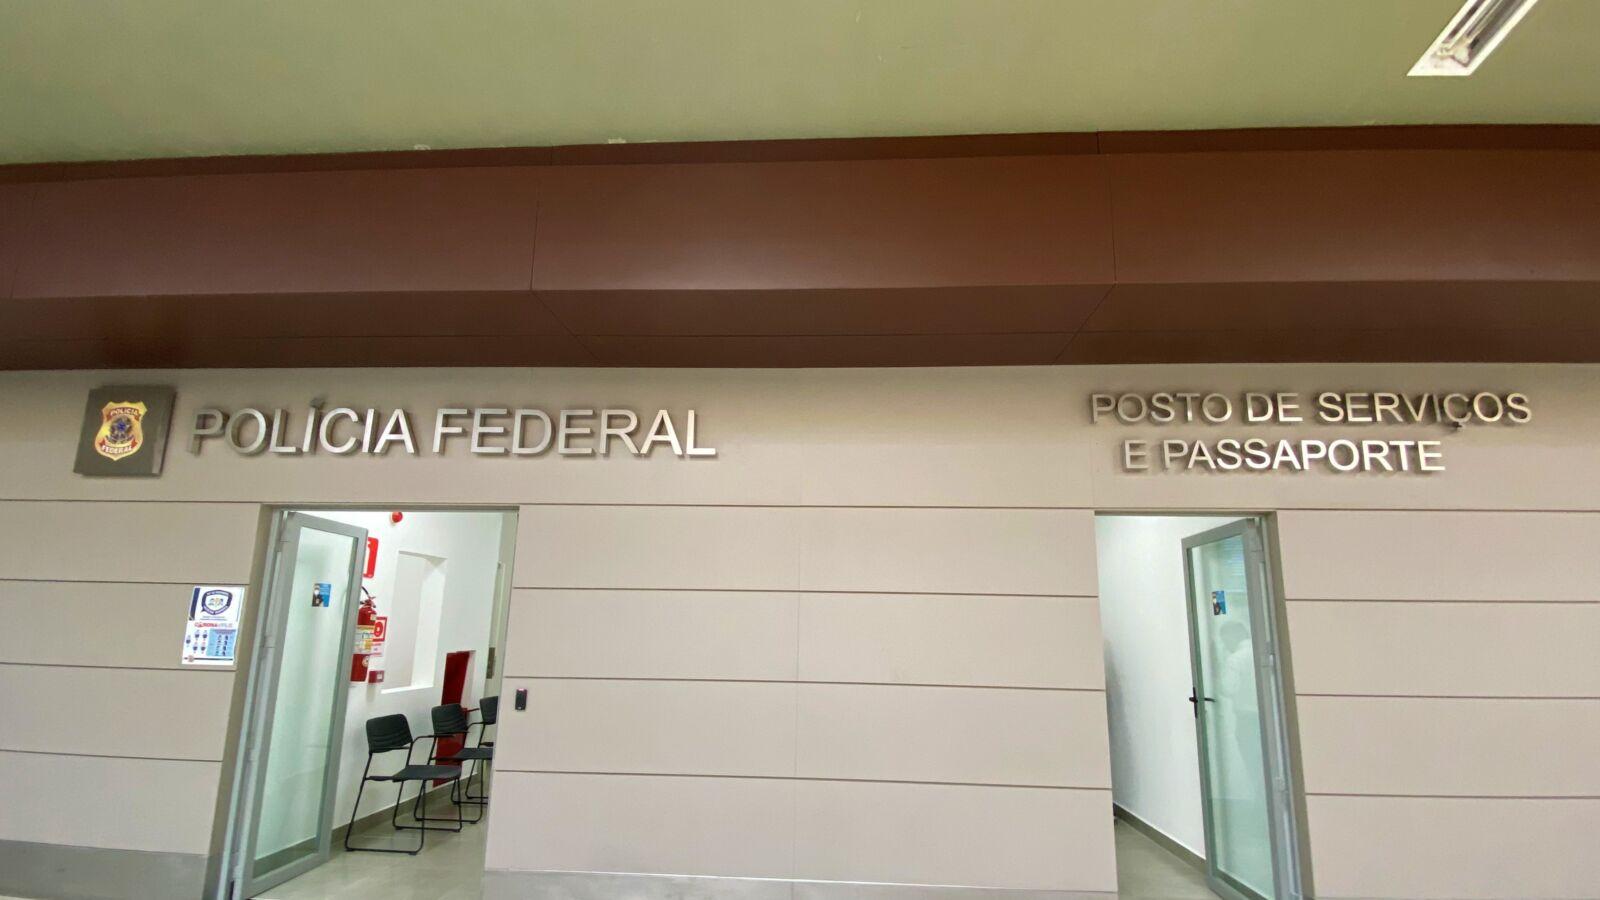 Aeroporto de Confins inaugura Posto de Serviços e Passaportes